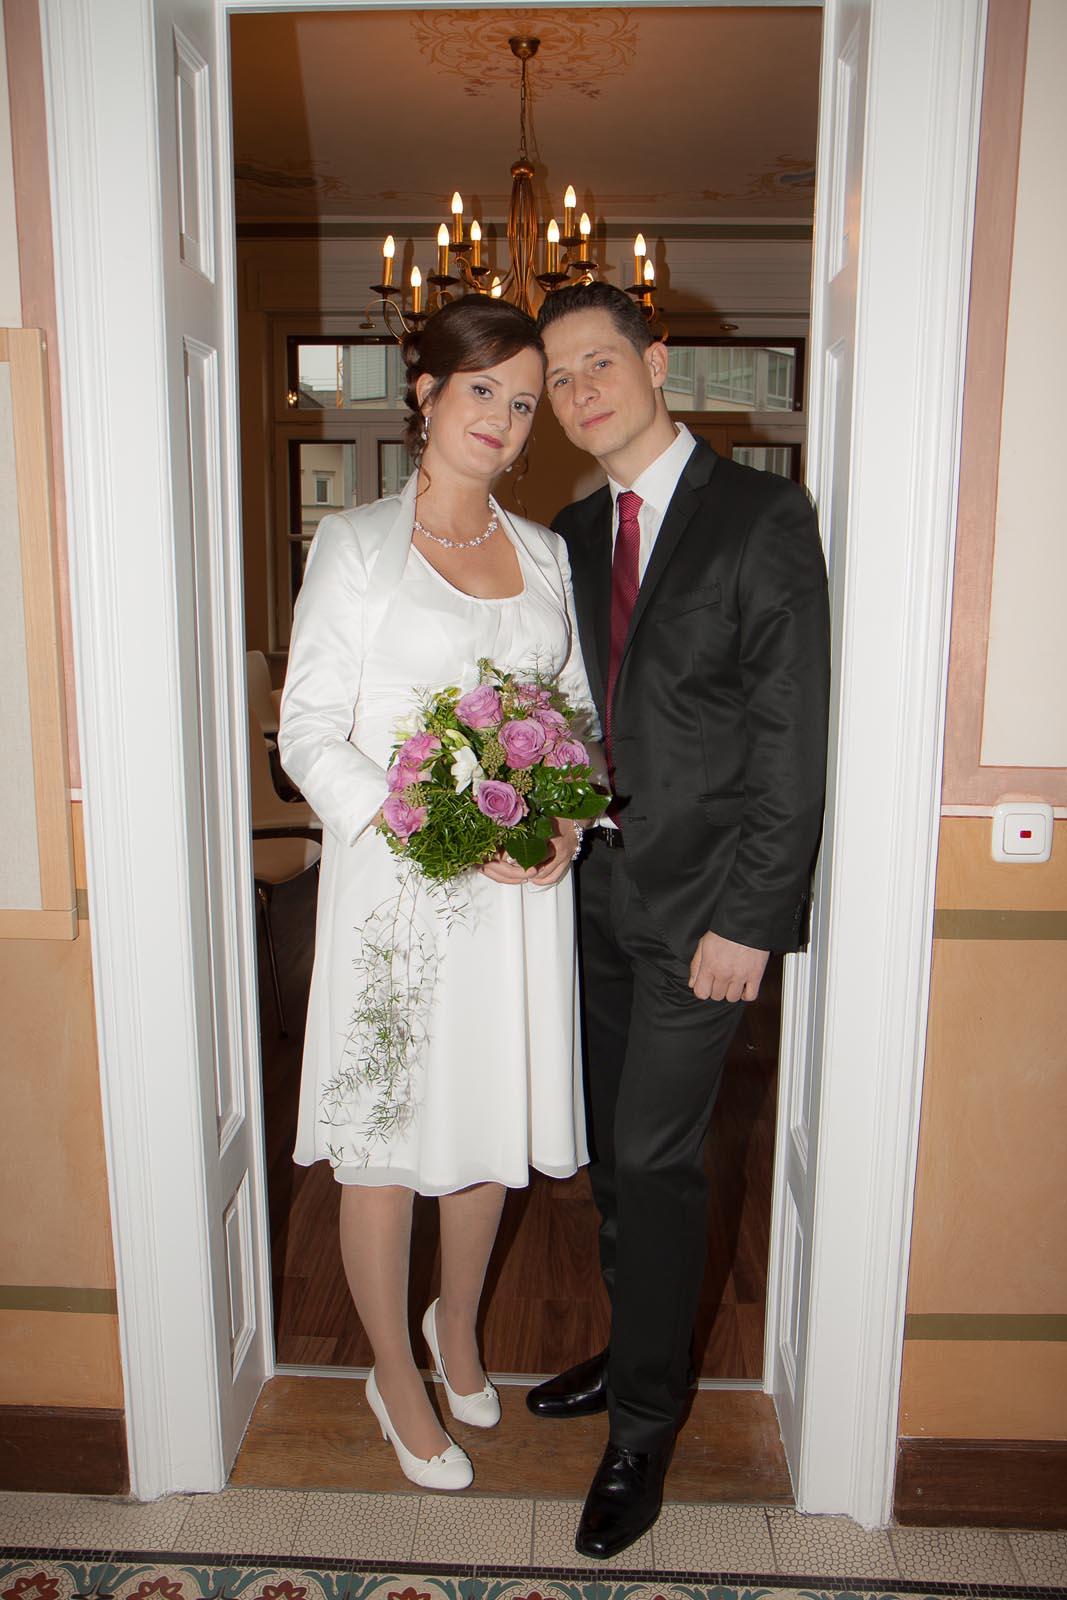 Hochzeit-Fleischmann-Hochzeit-Fleischmann-0213.jpg